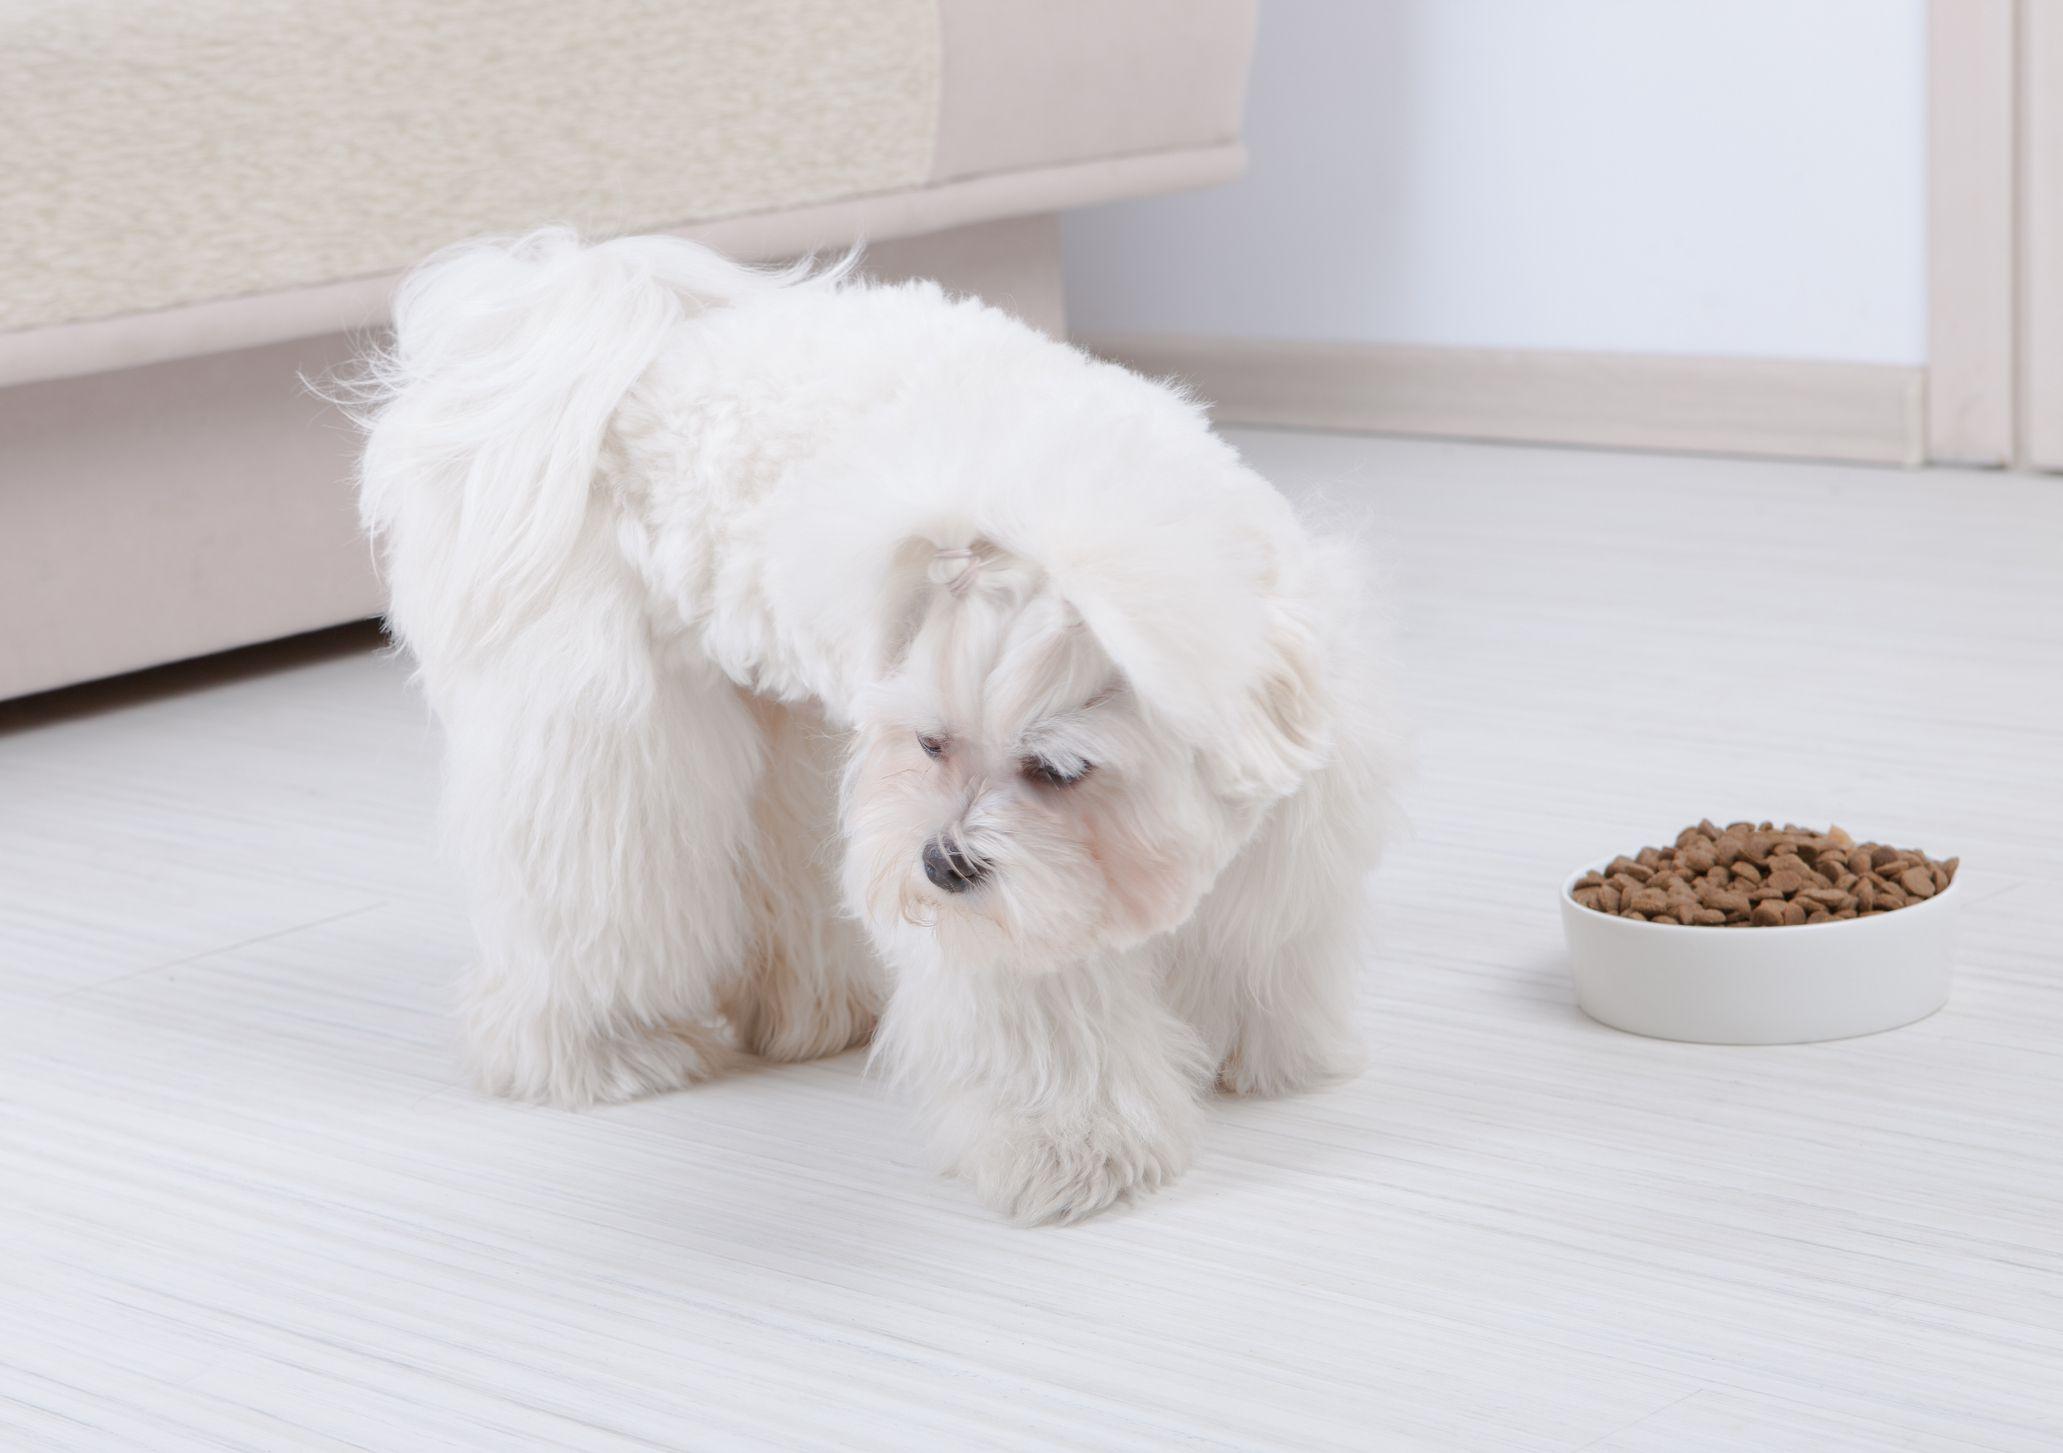 Maltese refusing to eat bowl of dry dog food.